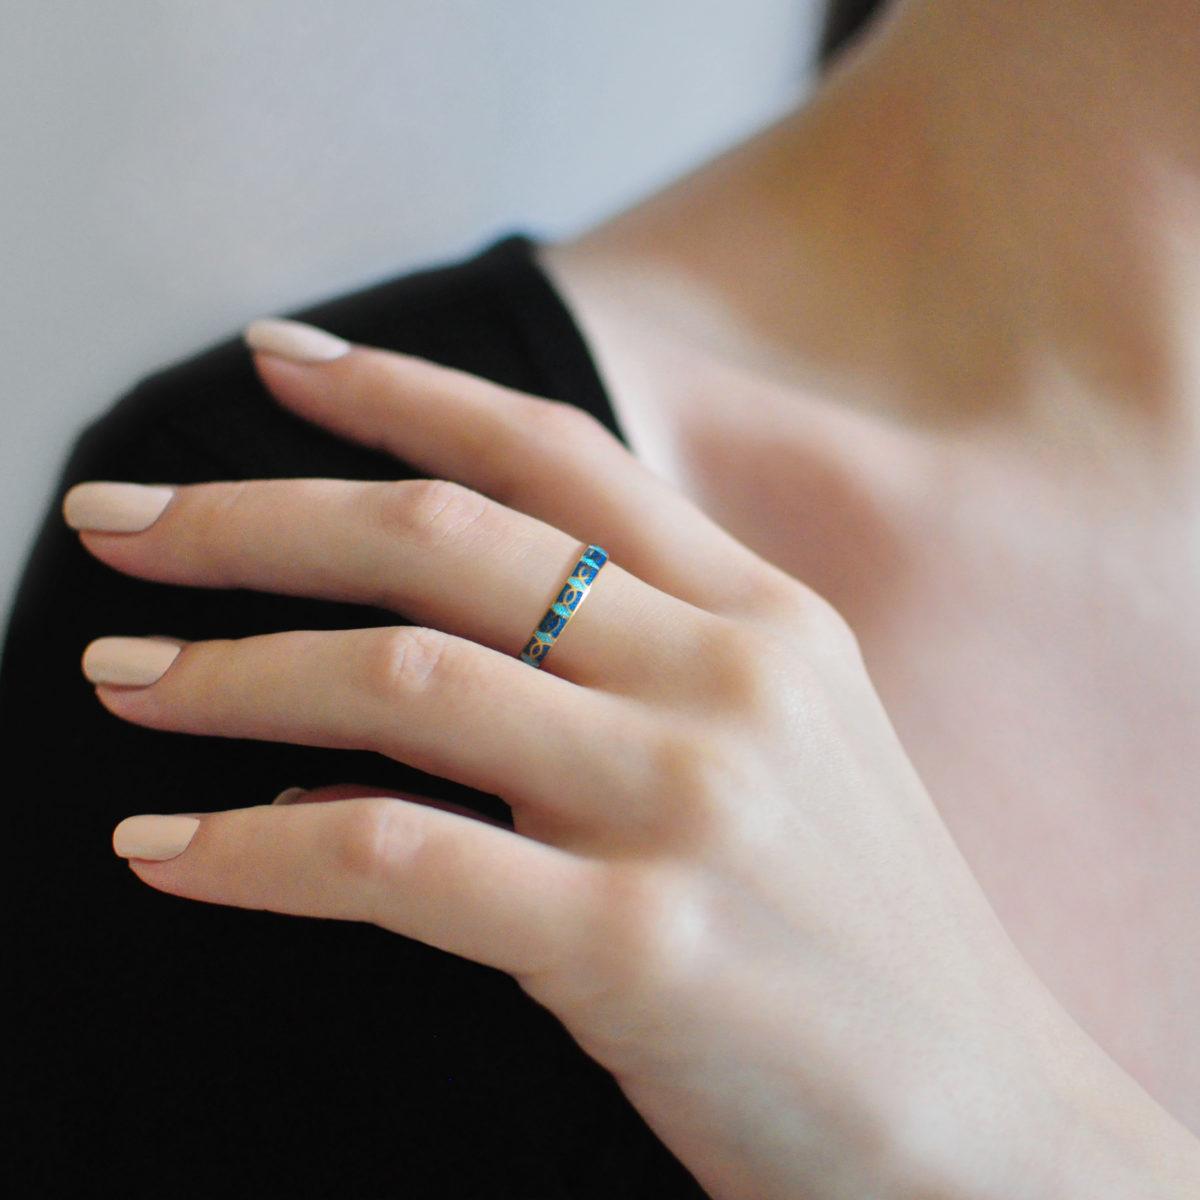 Zolochenie golubaya 9 1200x1200 - Кольцо серебряное «Седмица» (золочение), голубая